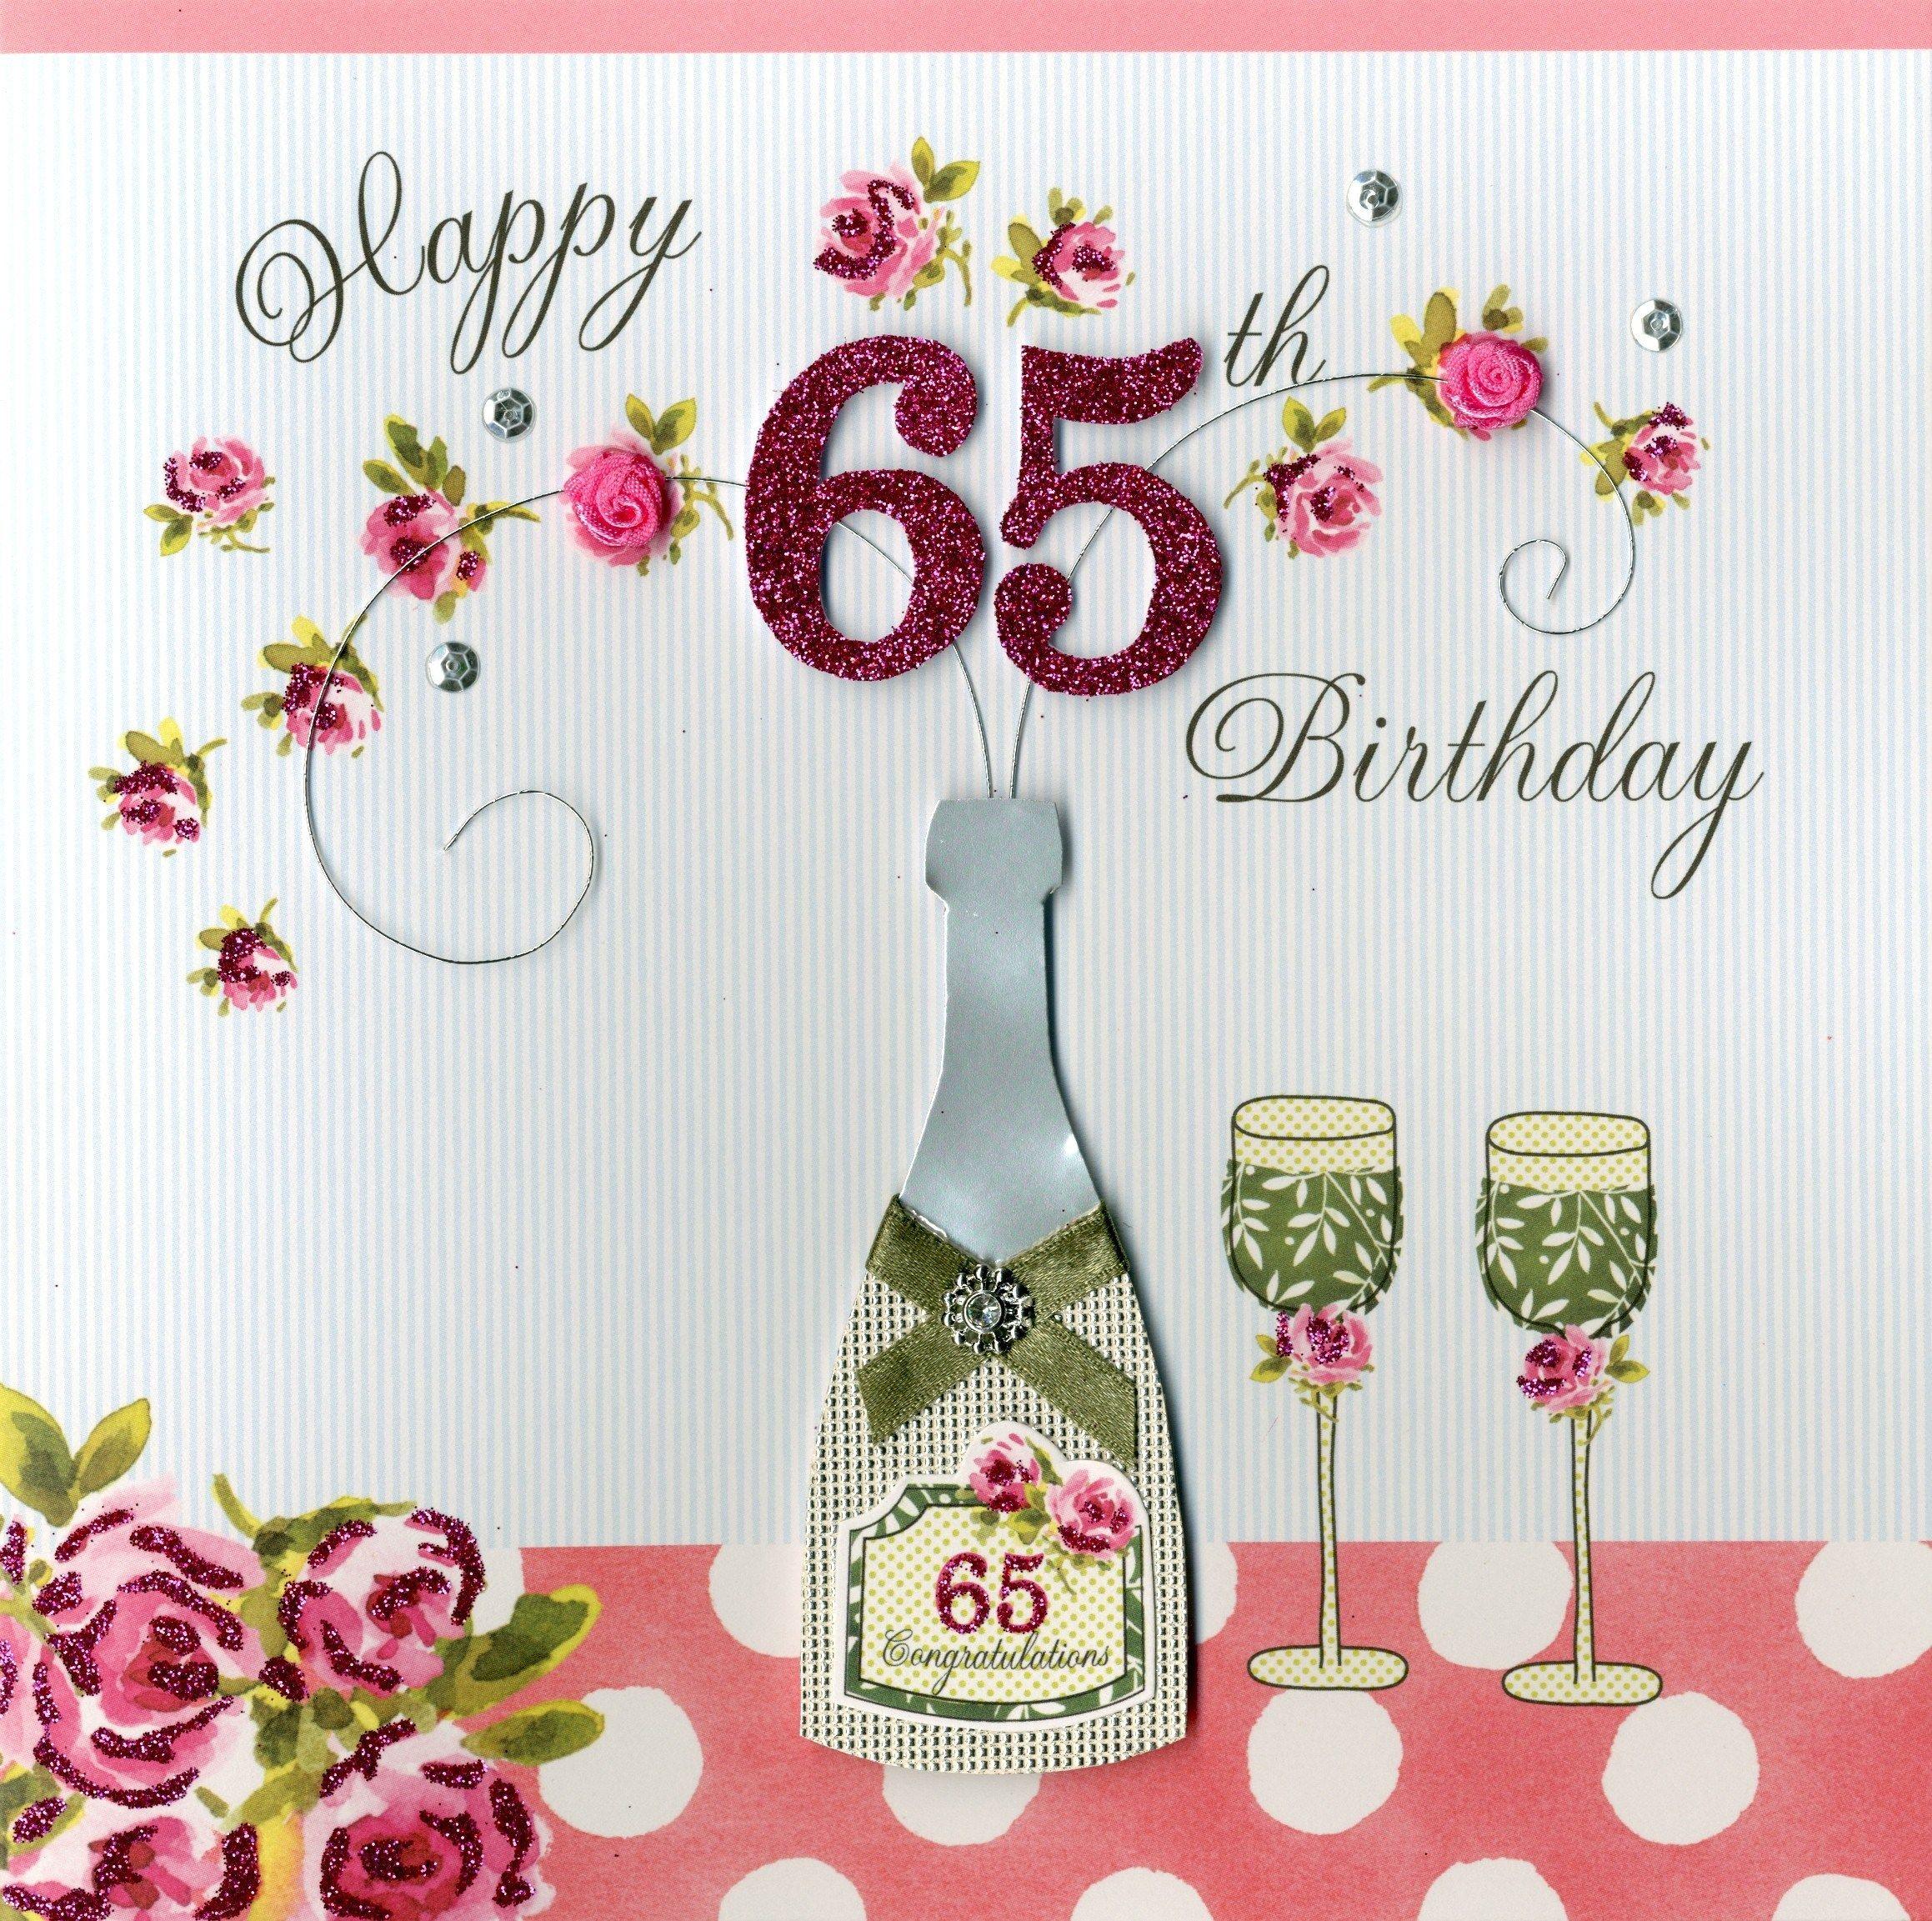 Handmade+Birthday+Cards+And+Gifts.+Happy+65th+Birthday